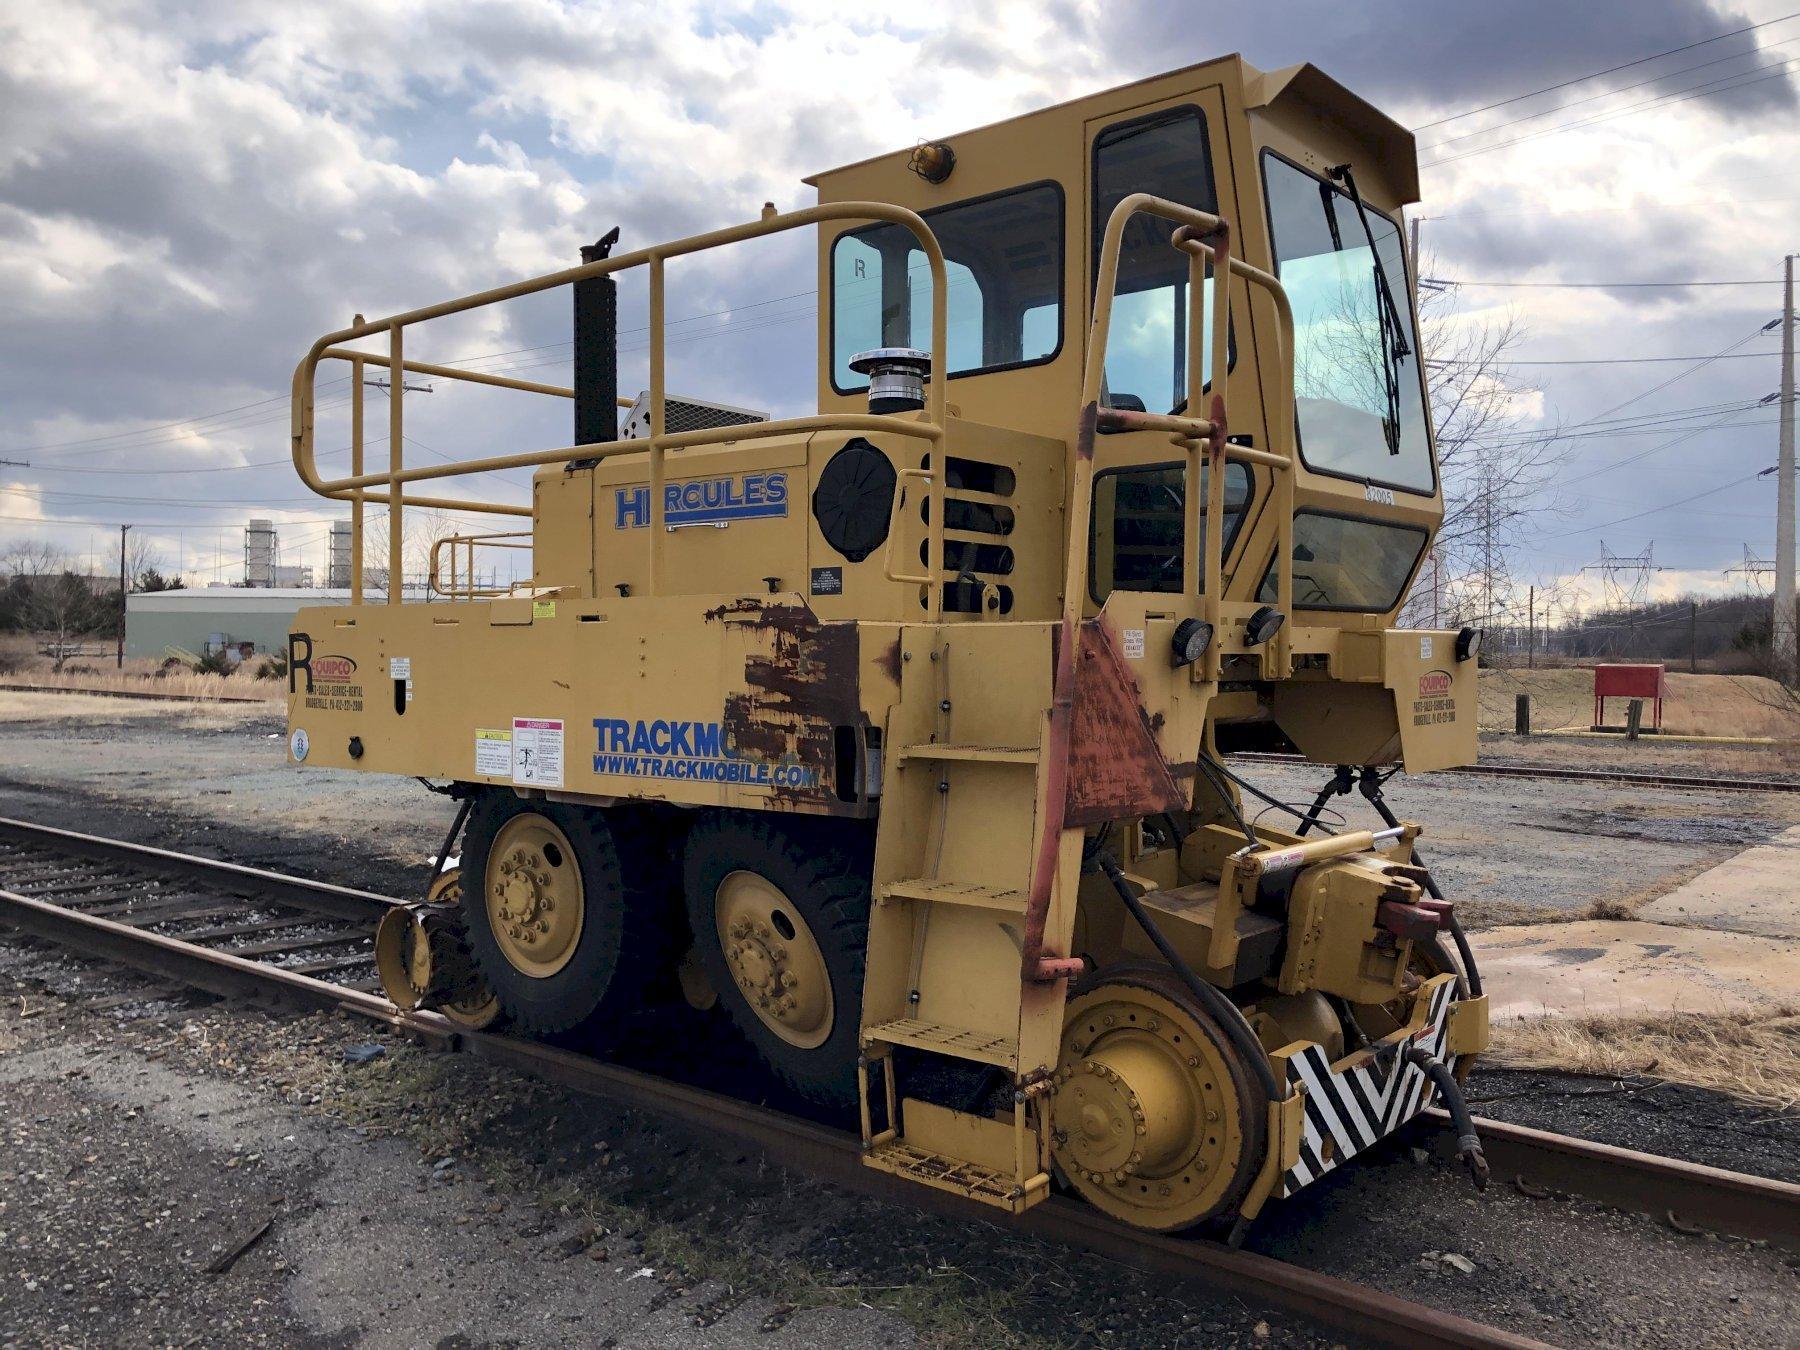 Trackmobile Hercules rail mover s/n lgn987531009 engine tm-1084476 s/n 46996757